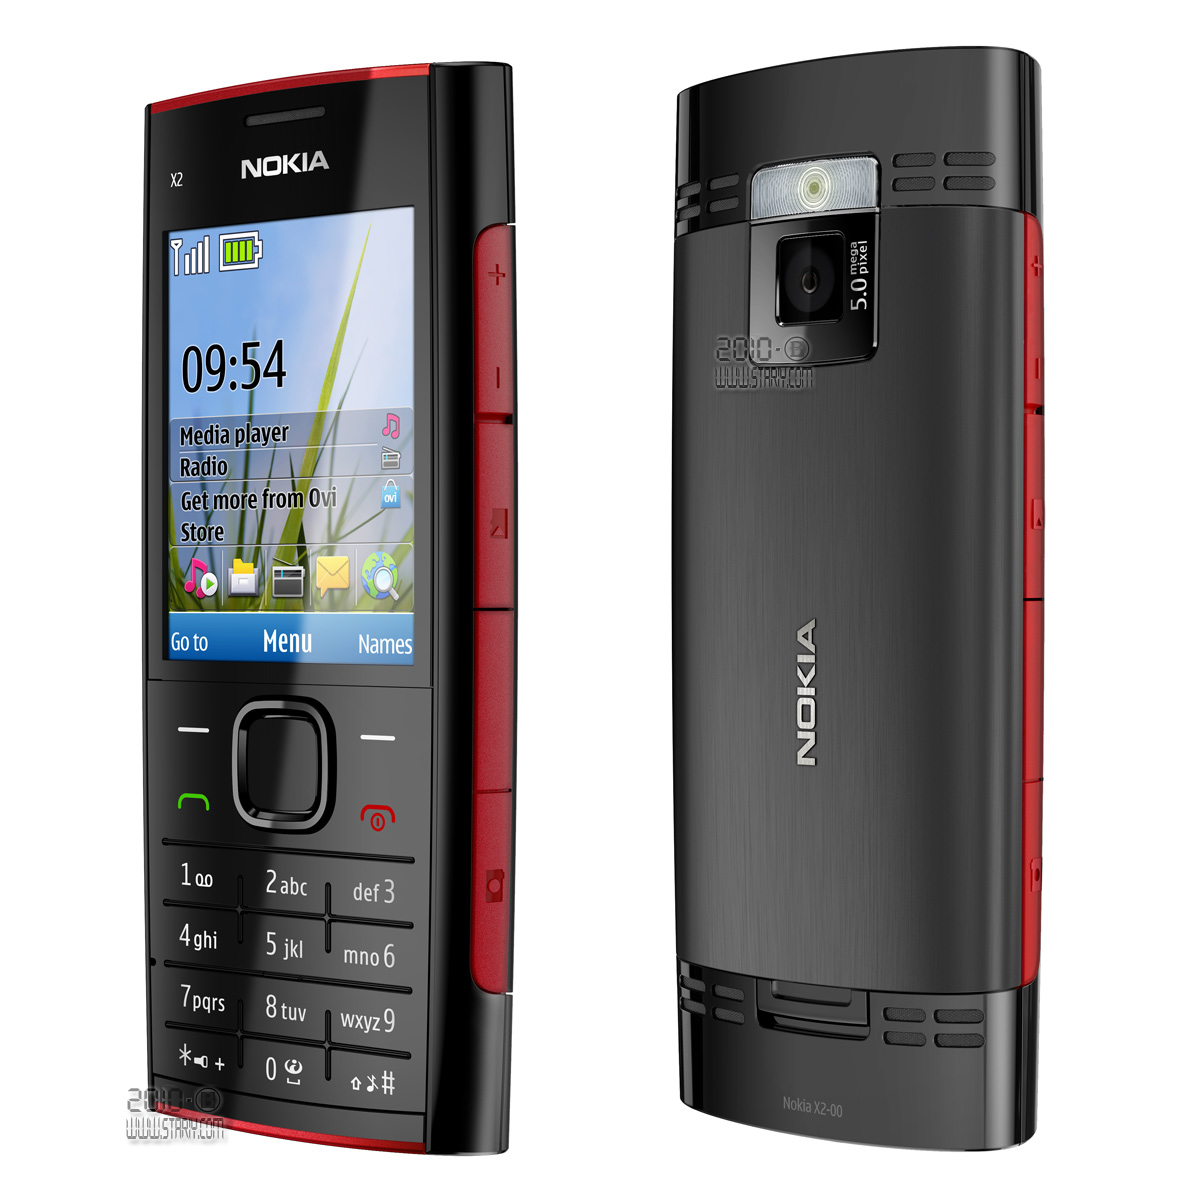 http://3.bp.blogspot.com/-TOycG-h4fkg/TitAGbgAyqI/AAAAAAAACtA/ePqS0Z_dqRc/s1600/Nokia-X2.jpg